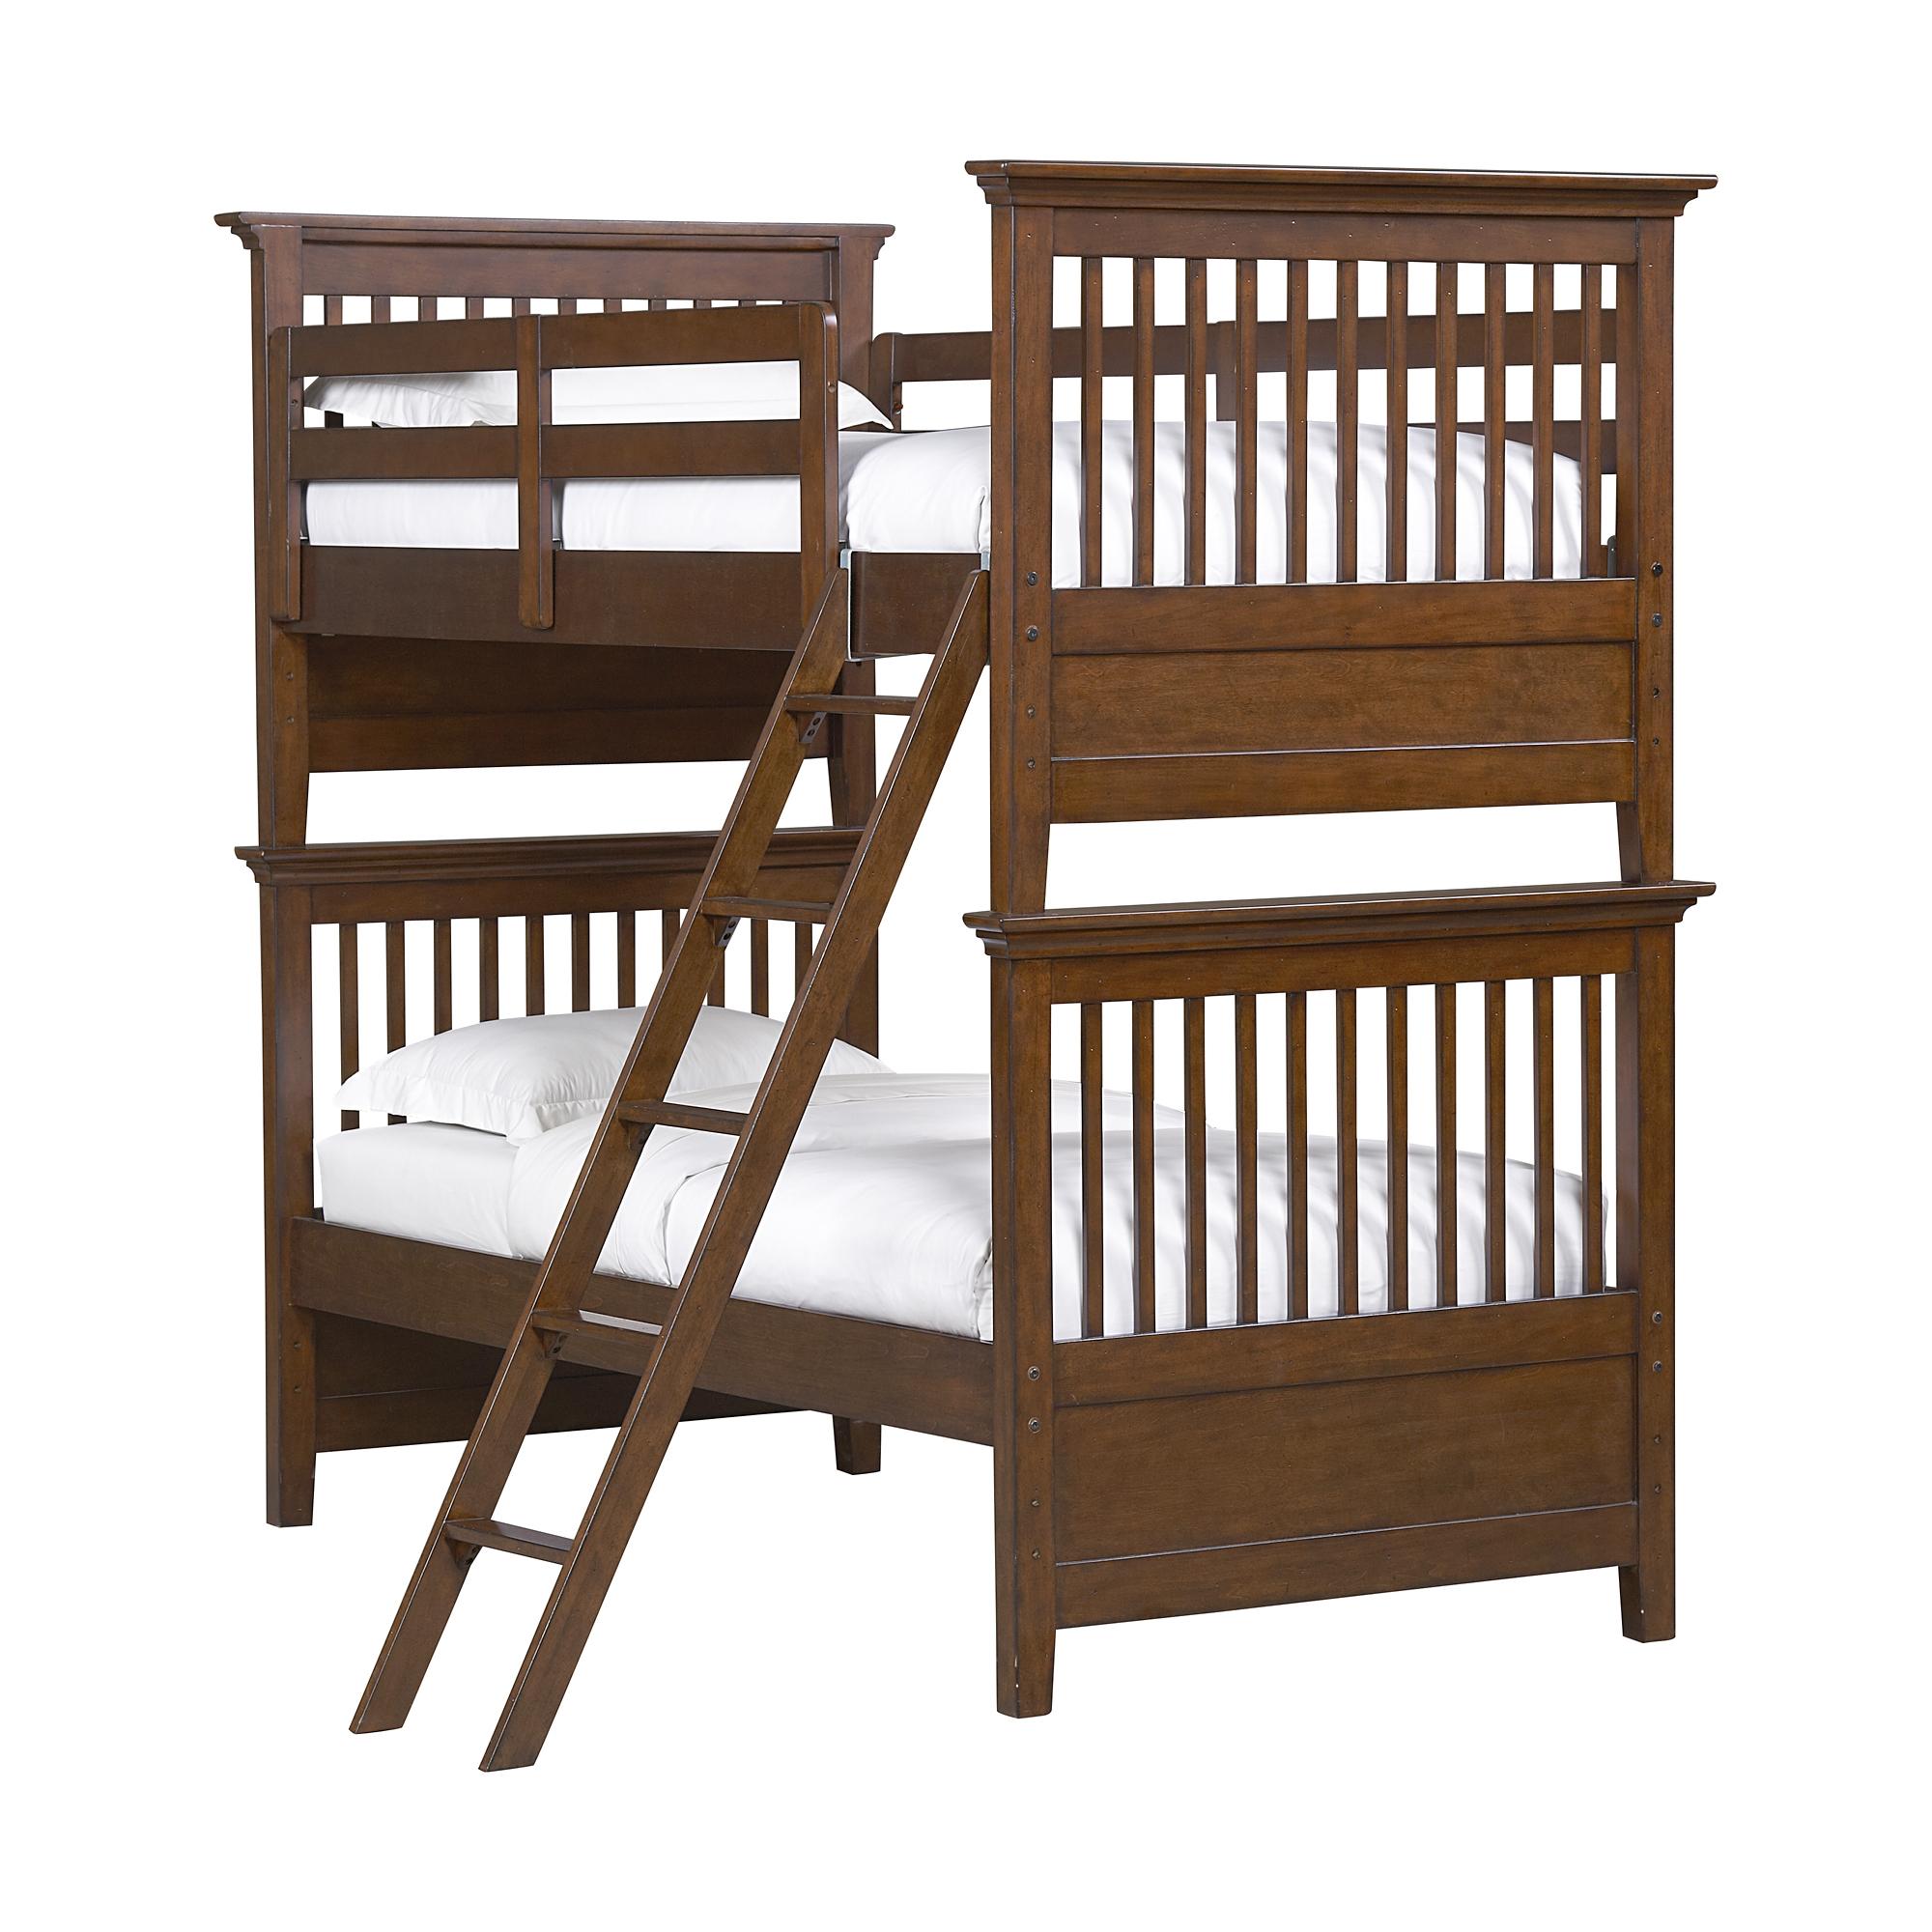 Havertys Bayview Bunk Beds